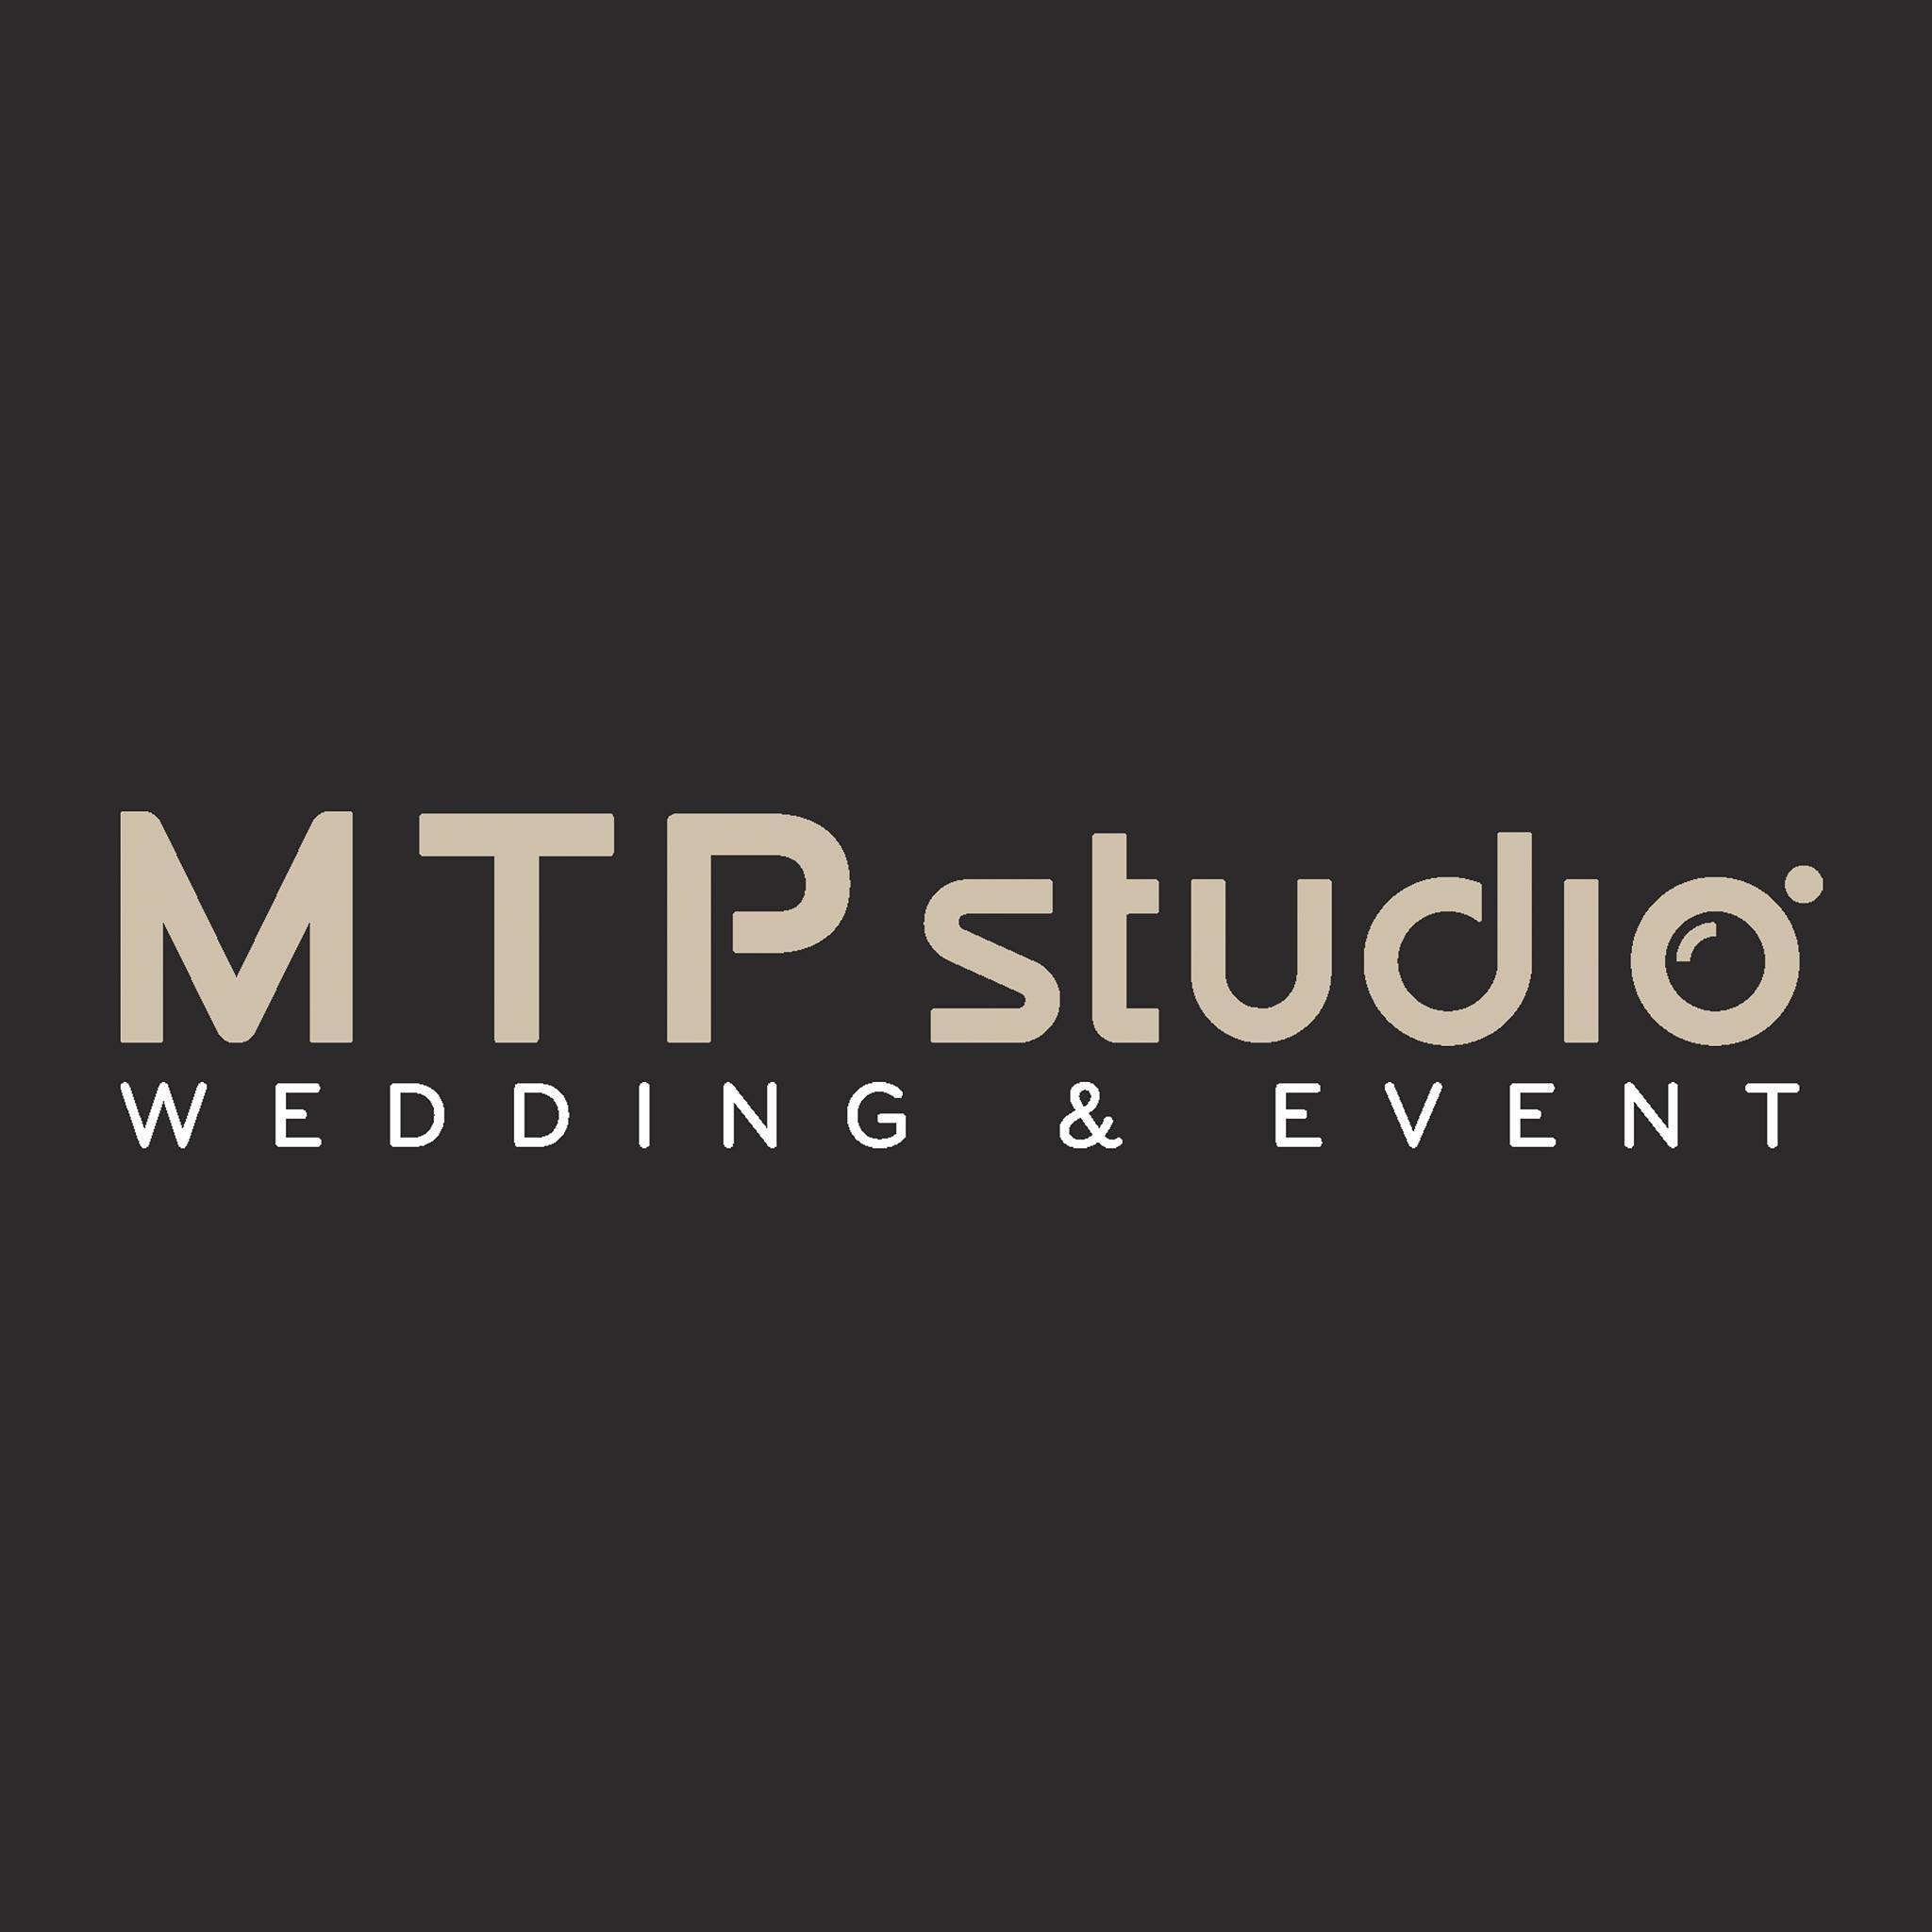 MTP STUDIO